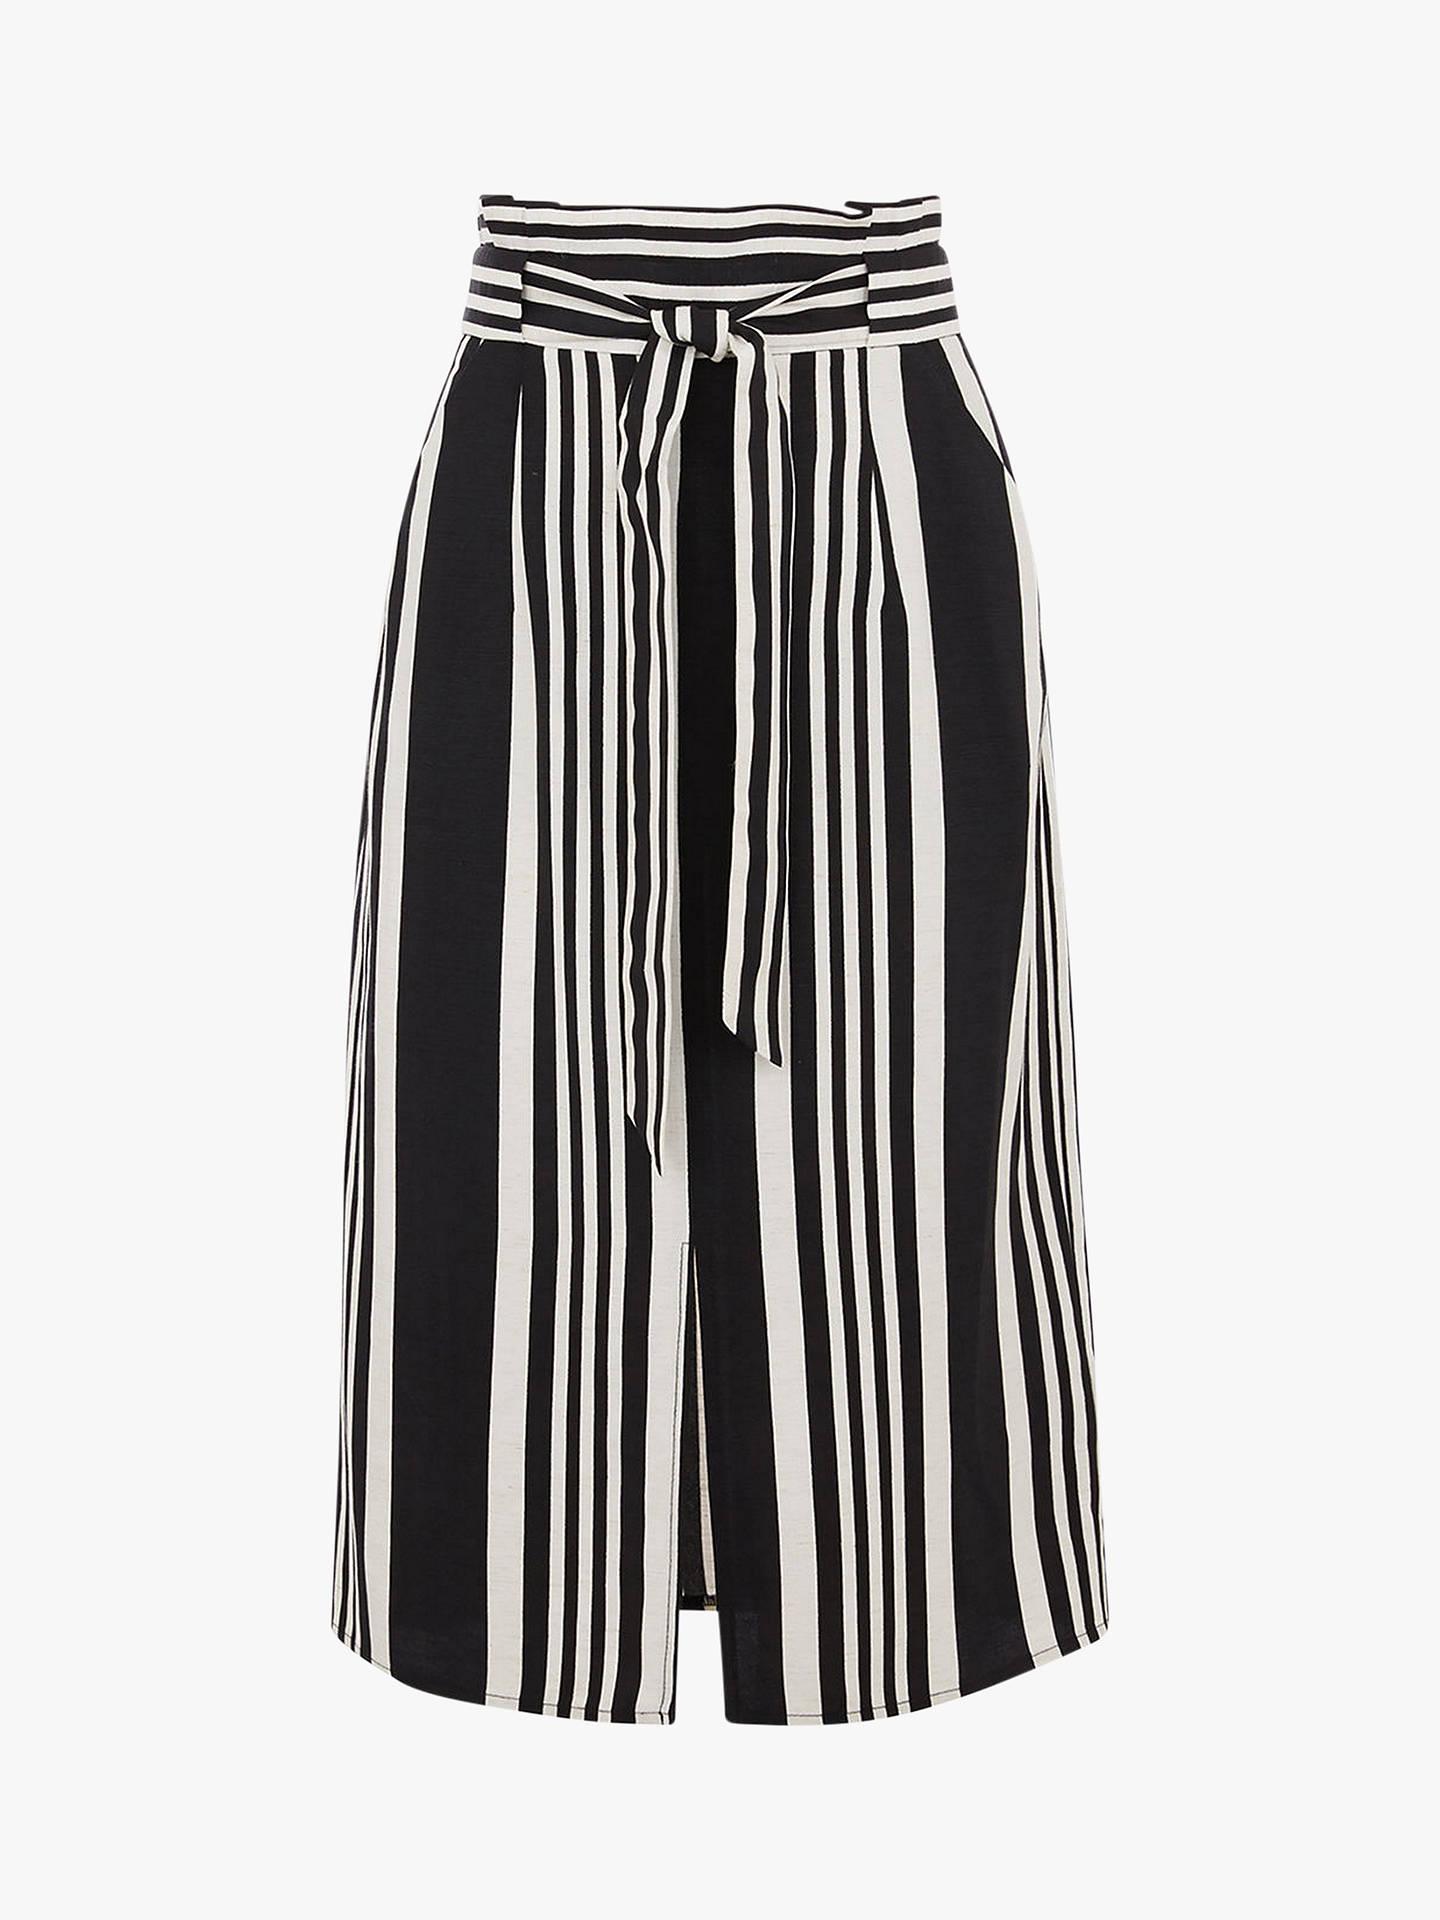 6411f73e67 ... Buy Oasis Stripe Pencil Skirt, Black/White, 14 Online at johnlewis.com  ...